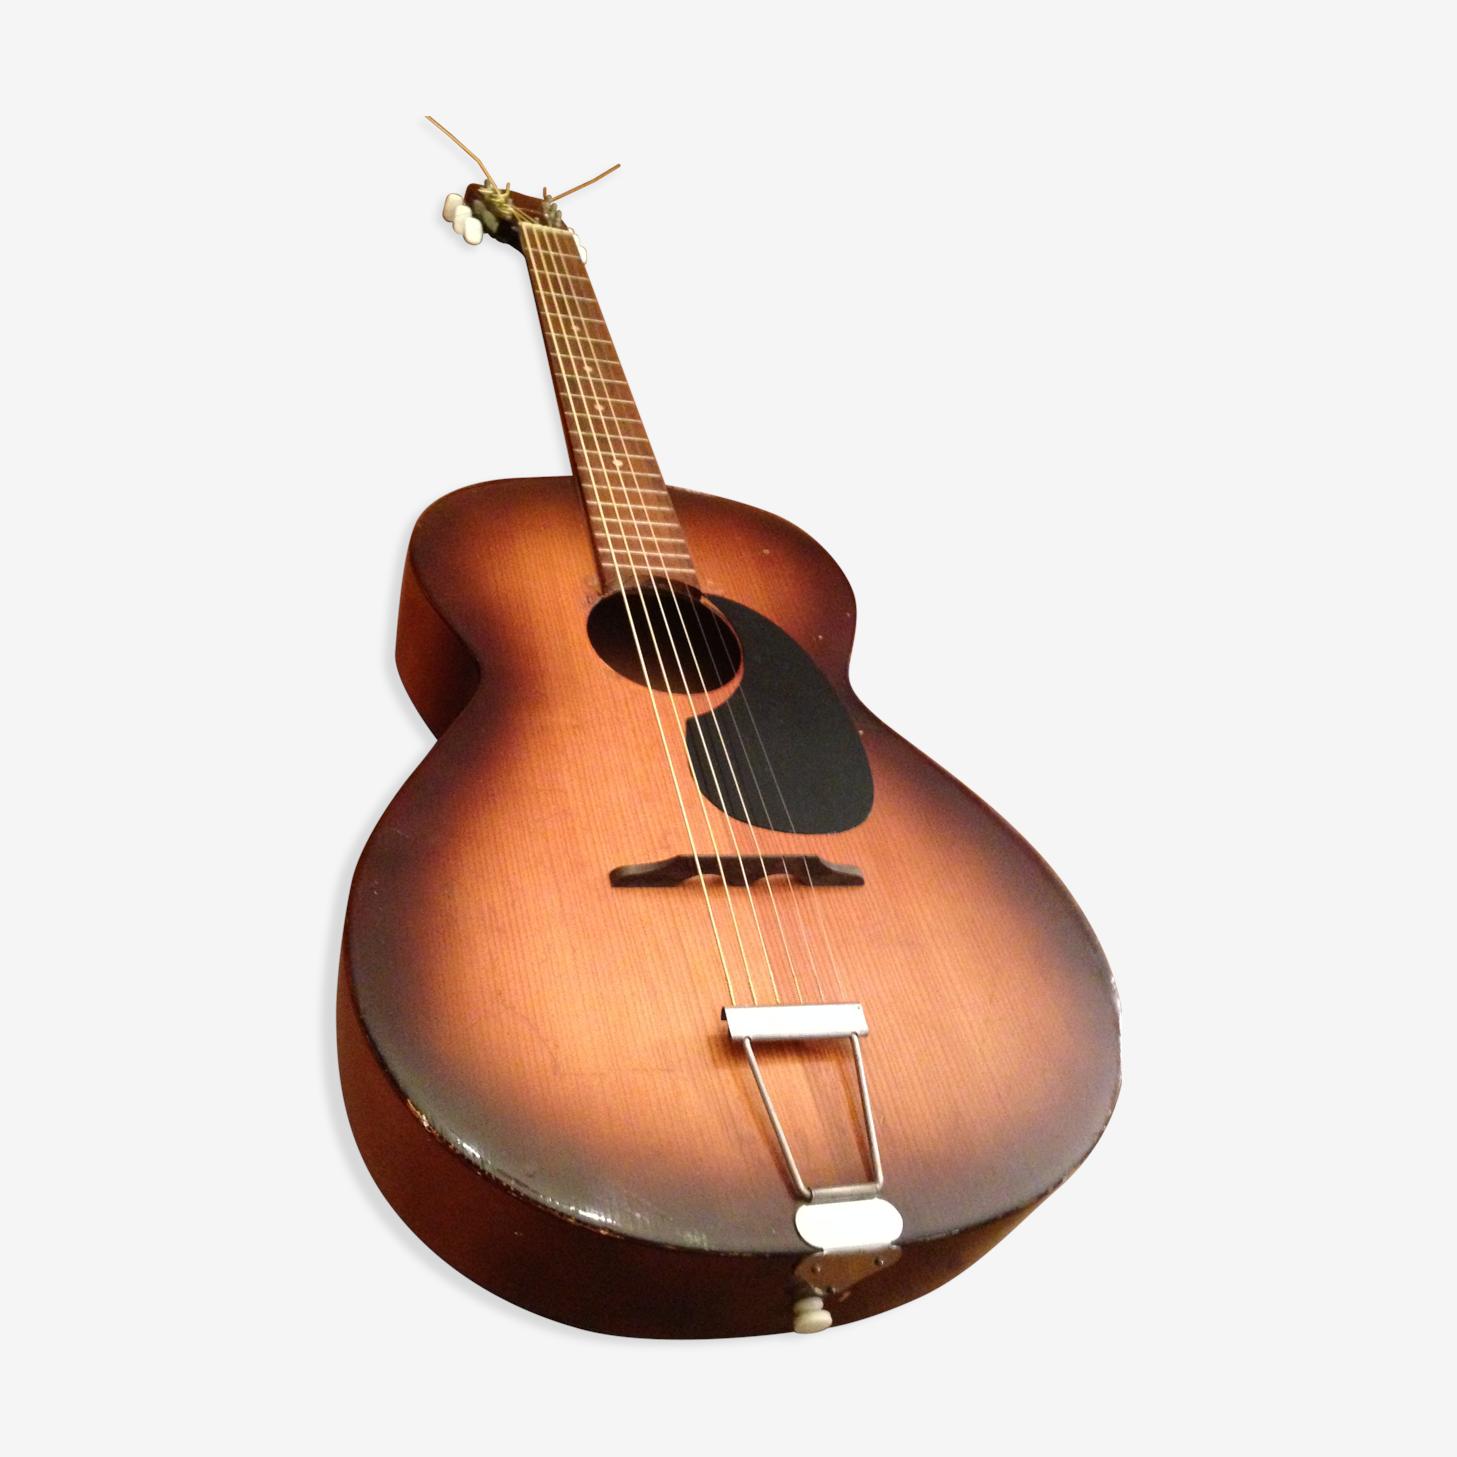 Guitare Framus Parlor 1970